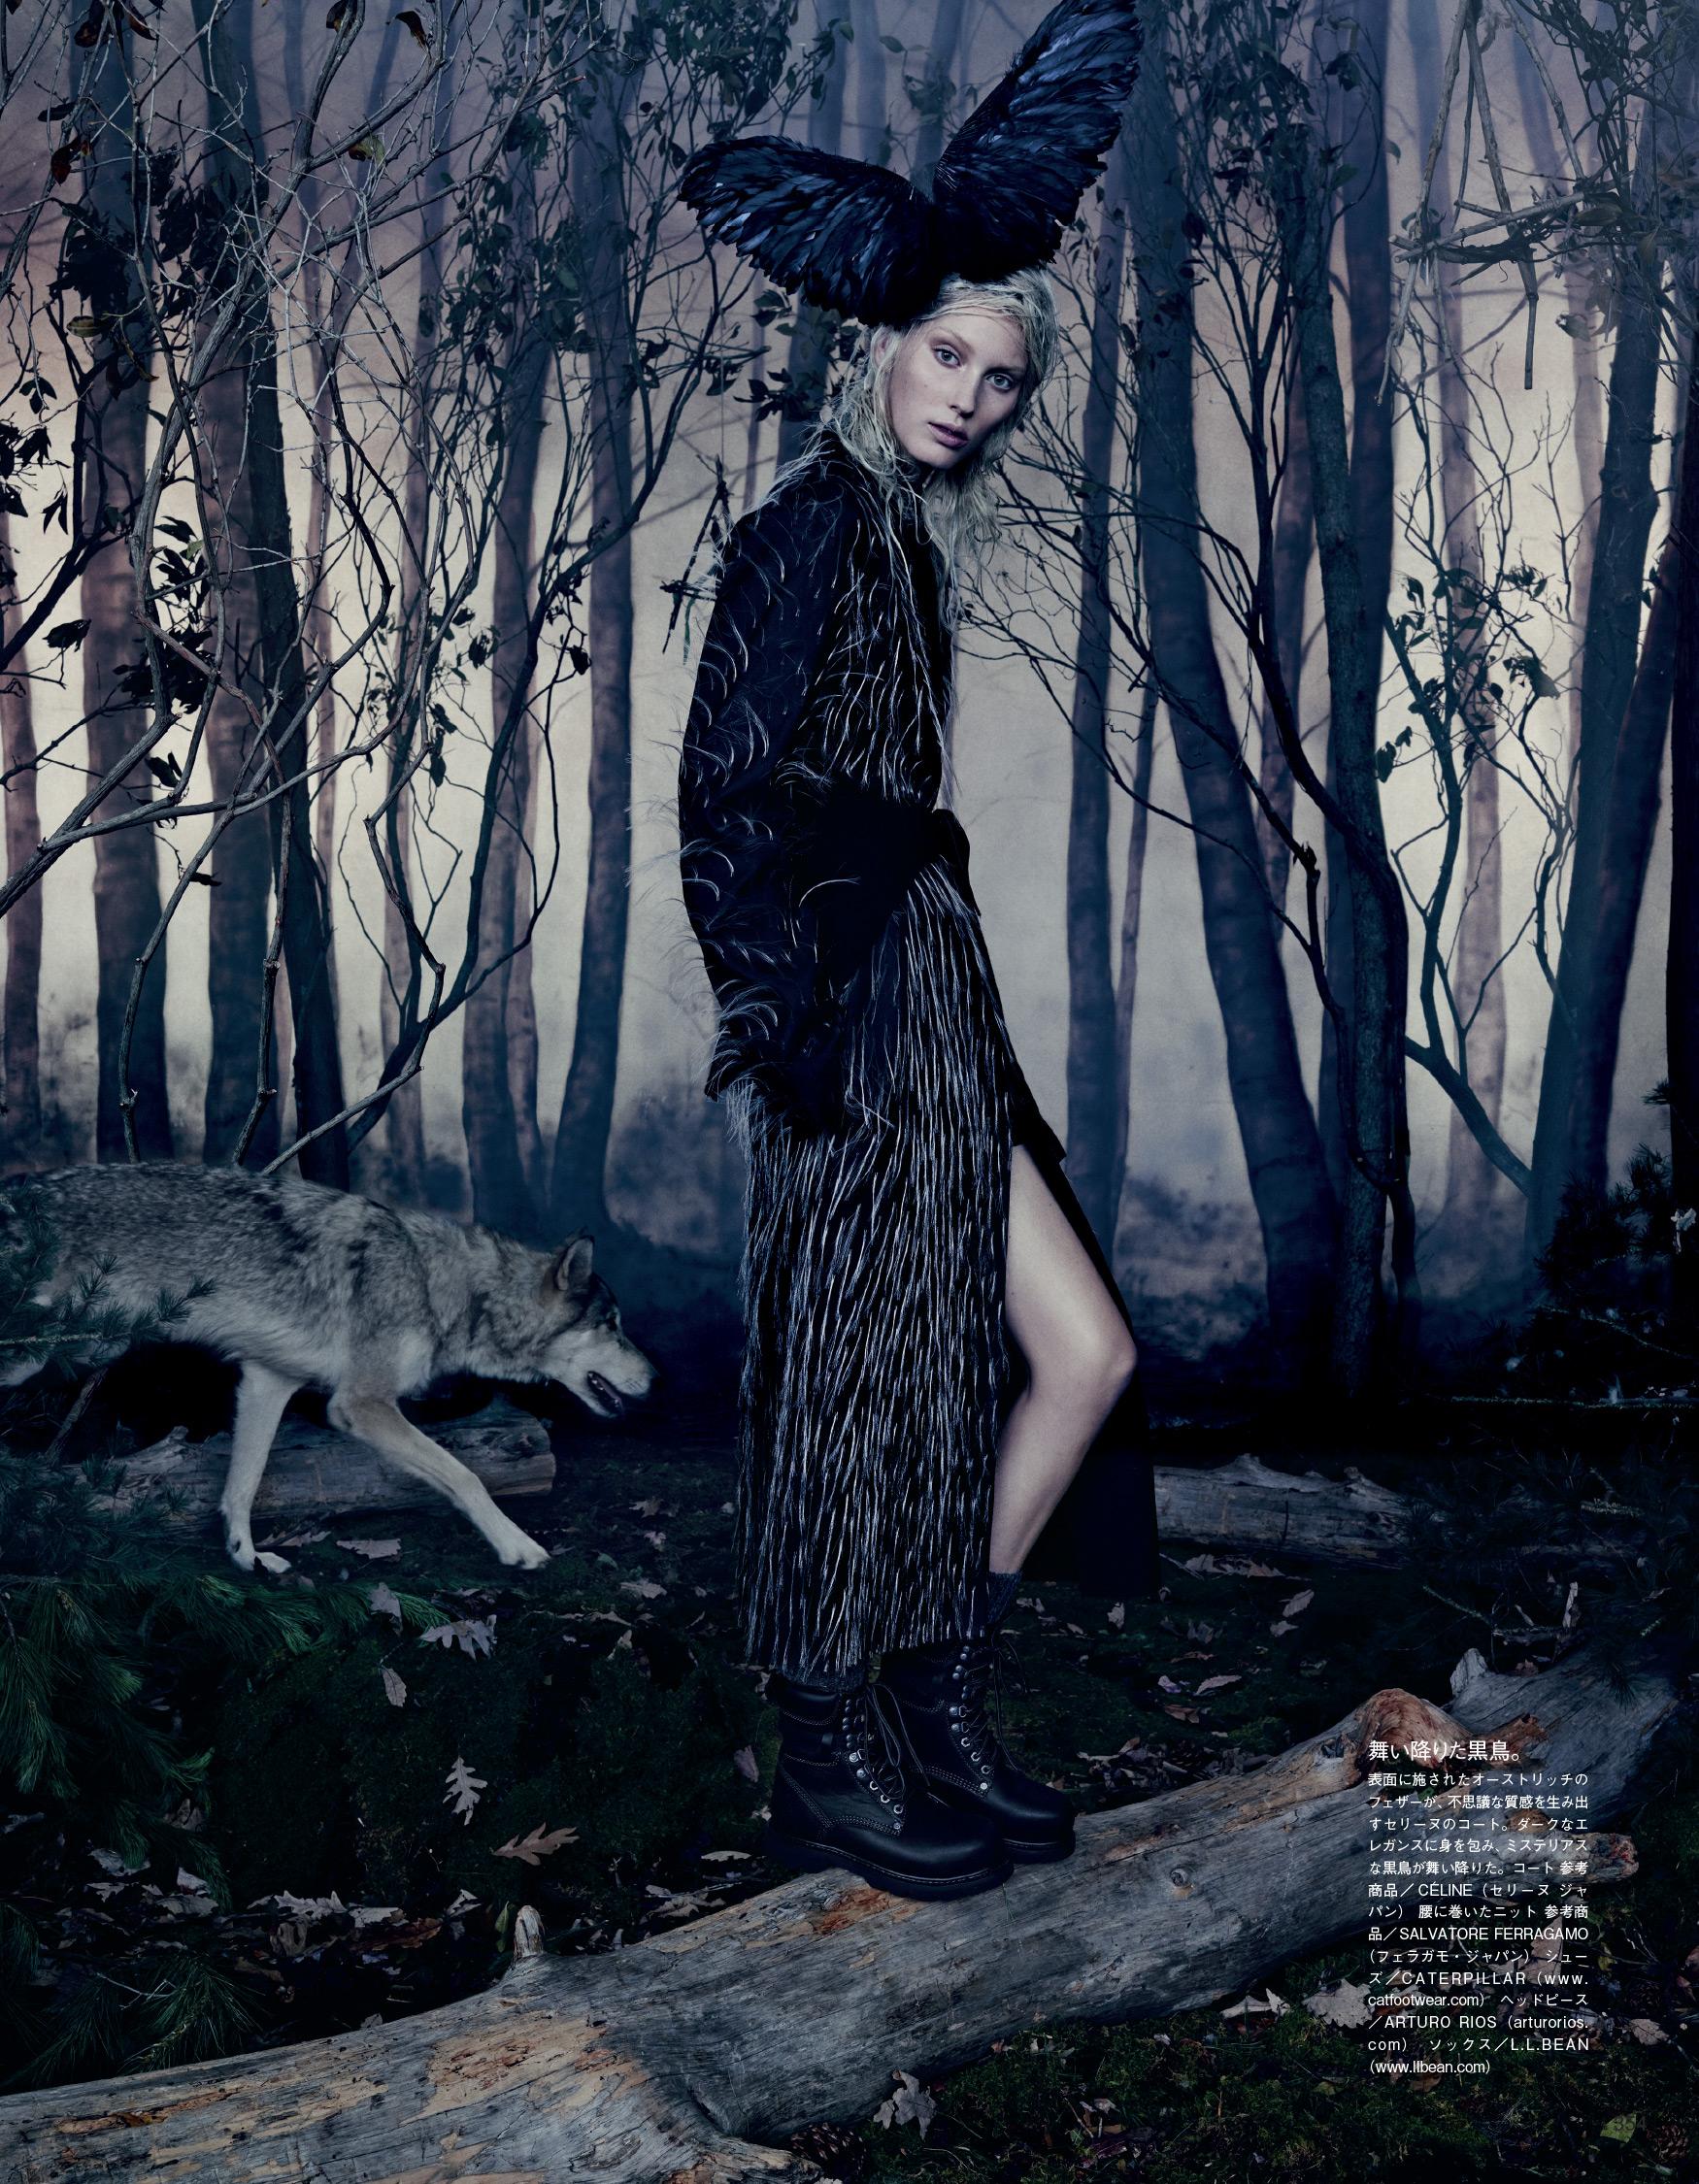 Giovanna-Battaglia-Into-The-Woods-Vogue-Japan-Emma-Summerton-04.jpg